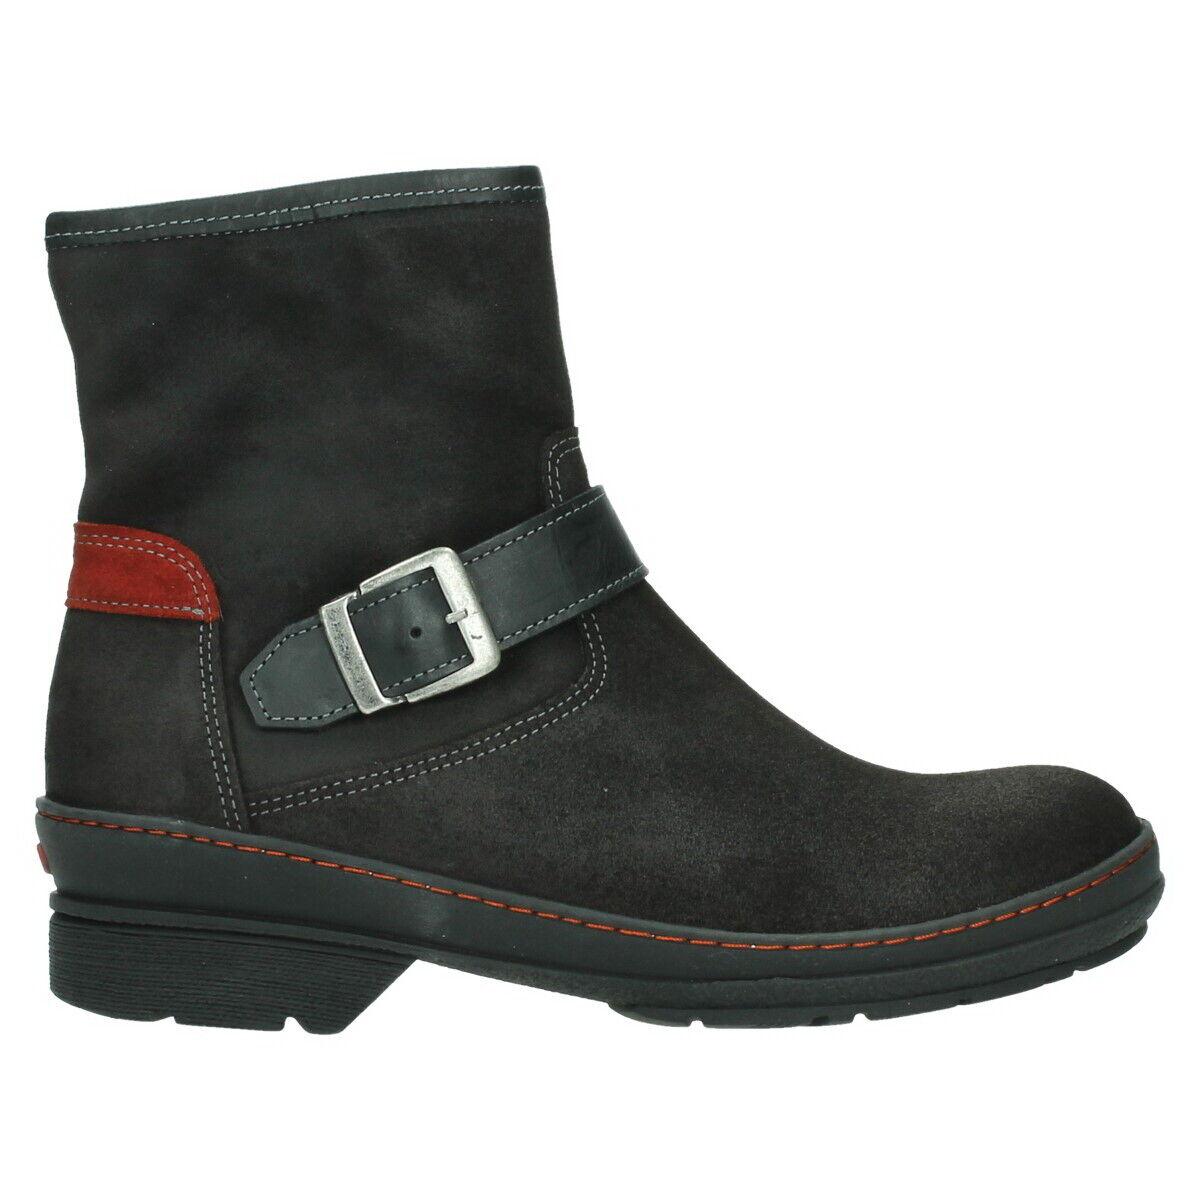 Wolky Stiefel Nitra Schwarz Nubuk Leder 07641 45000 Stiefel Reißverschluß